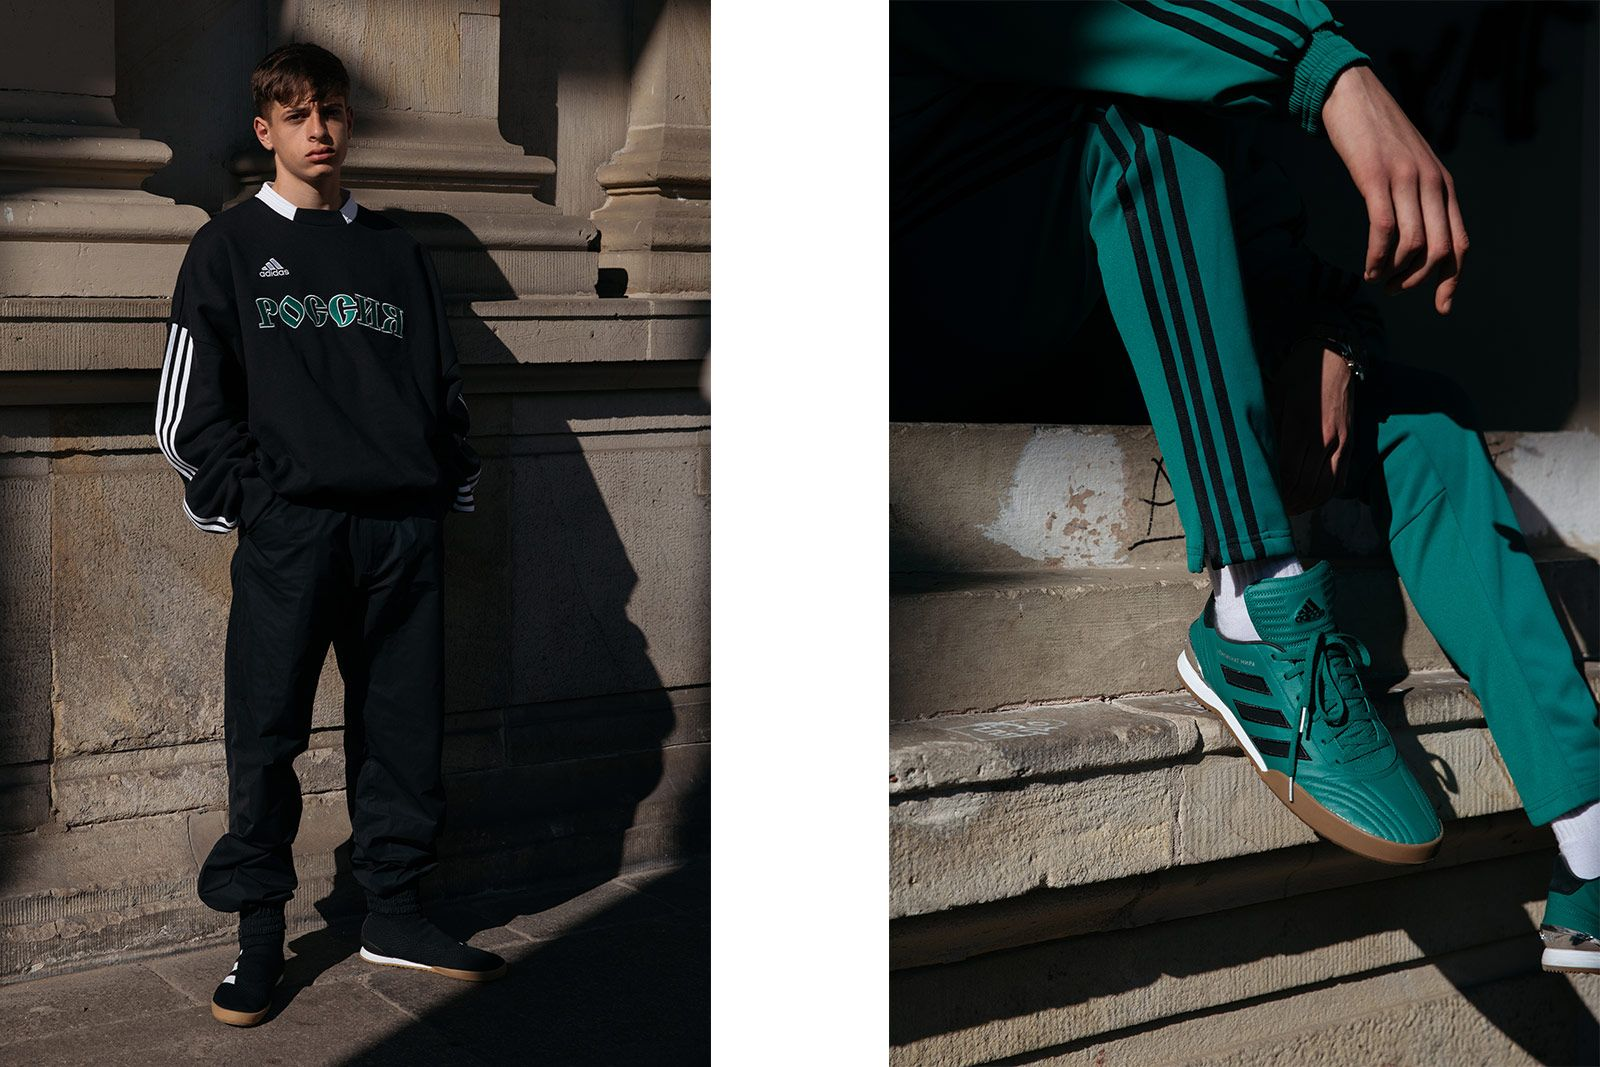 adidas football gosha rubchinskiy streetwear 2018 FIFA World Cup Gosha Rubchinskiy x adidas World Cup 2018 kith